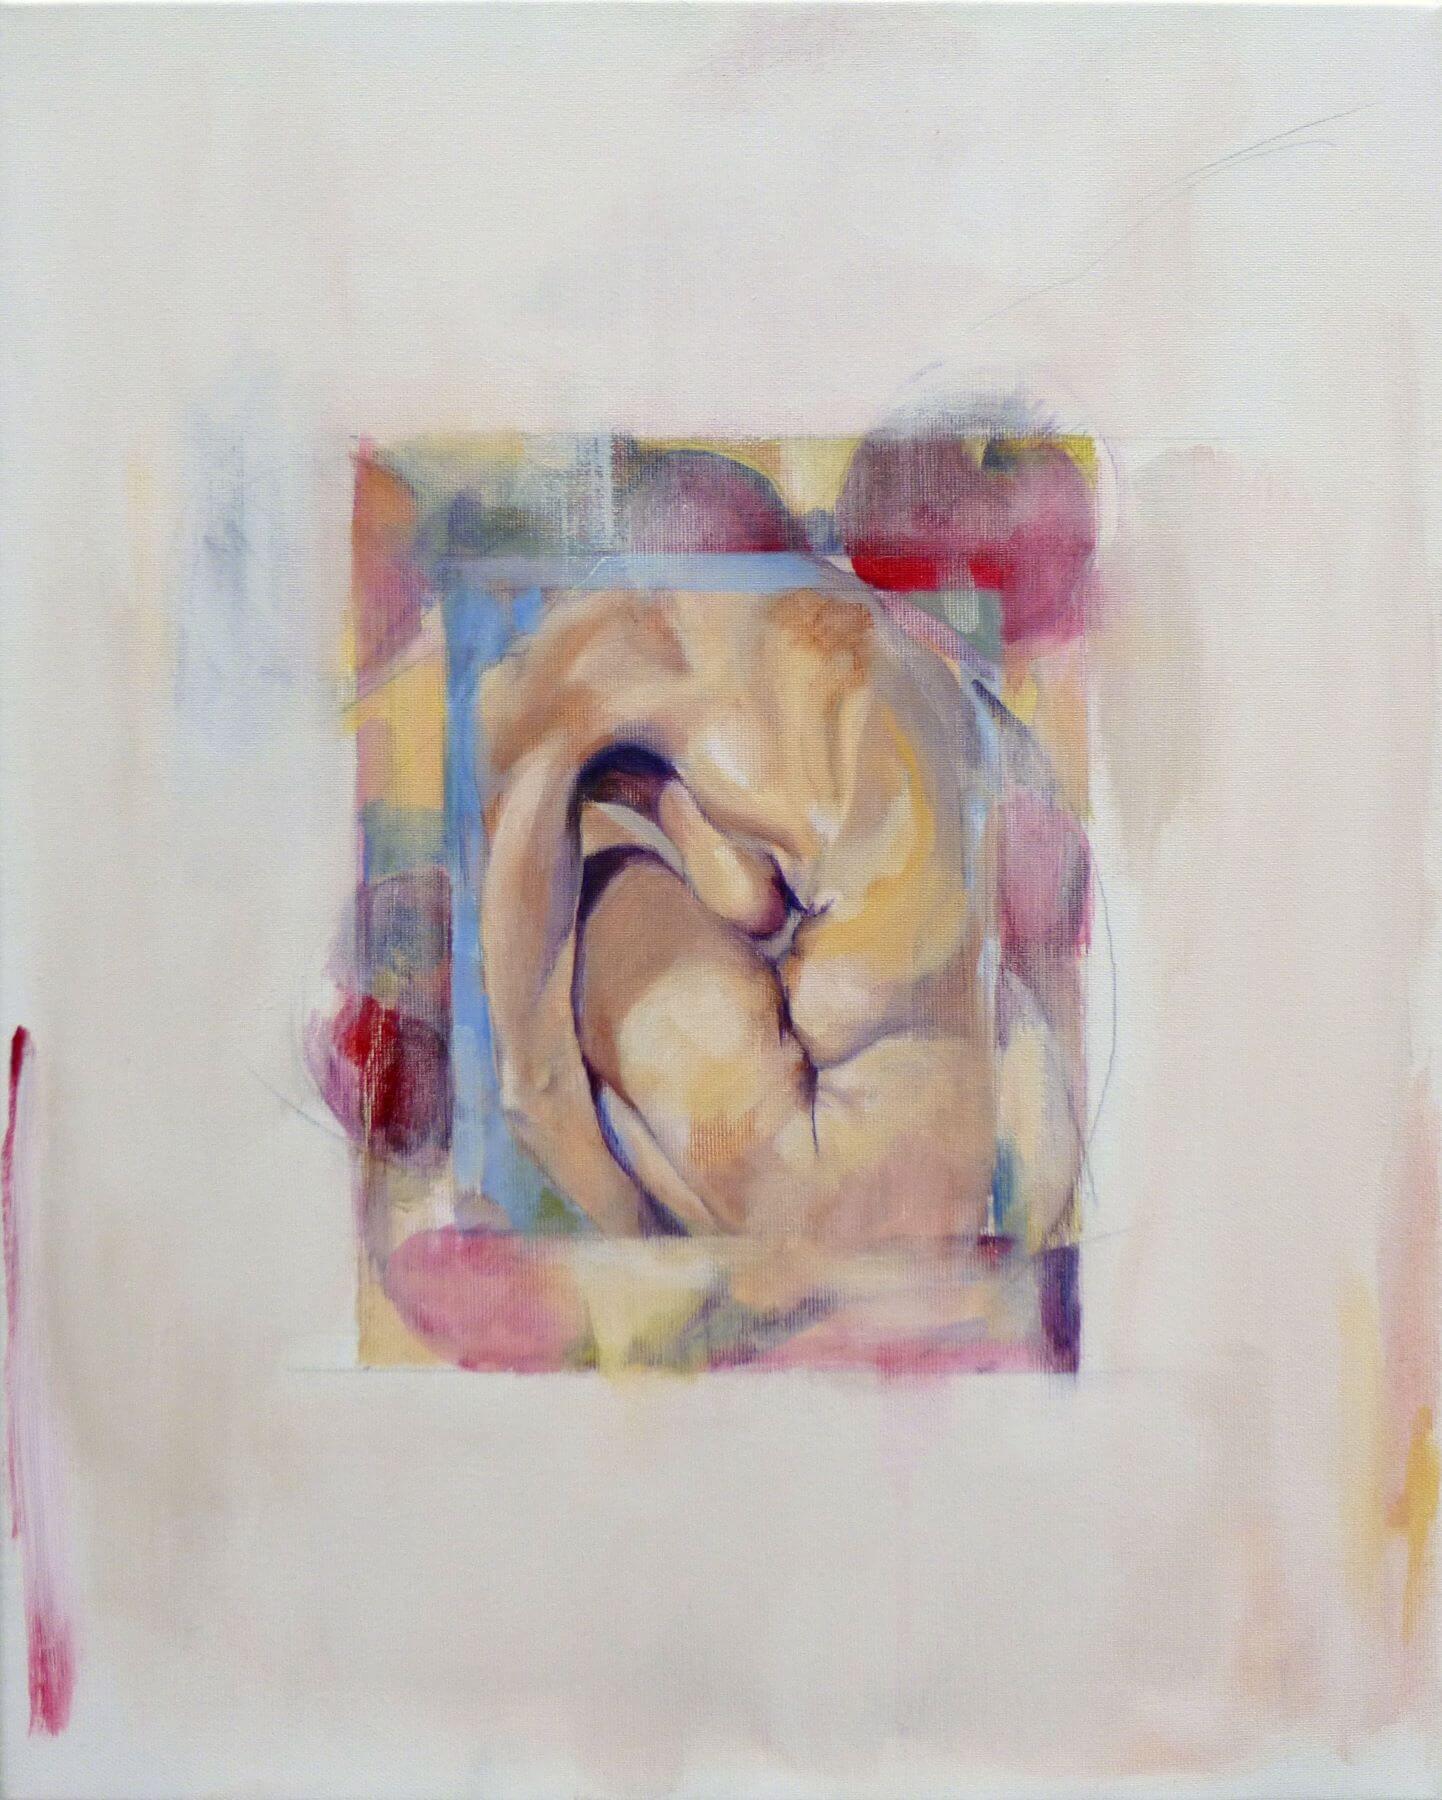 Pomegranate - painting, acrylic on canvas by artist Neva Bergemann